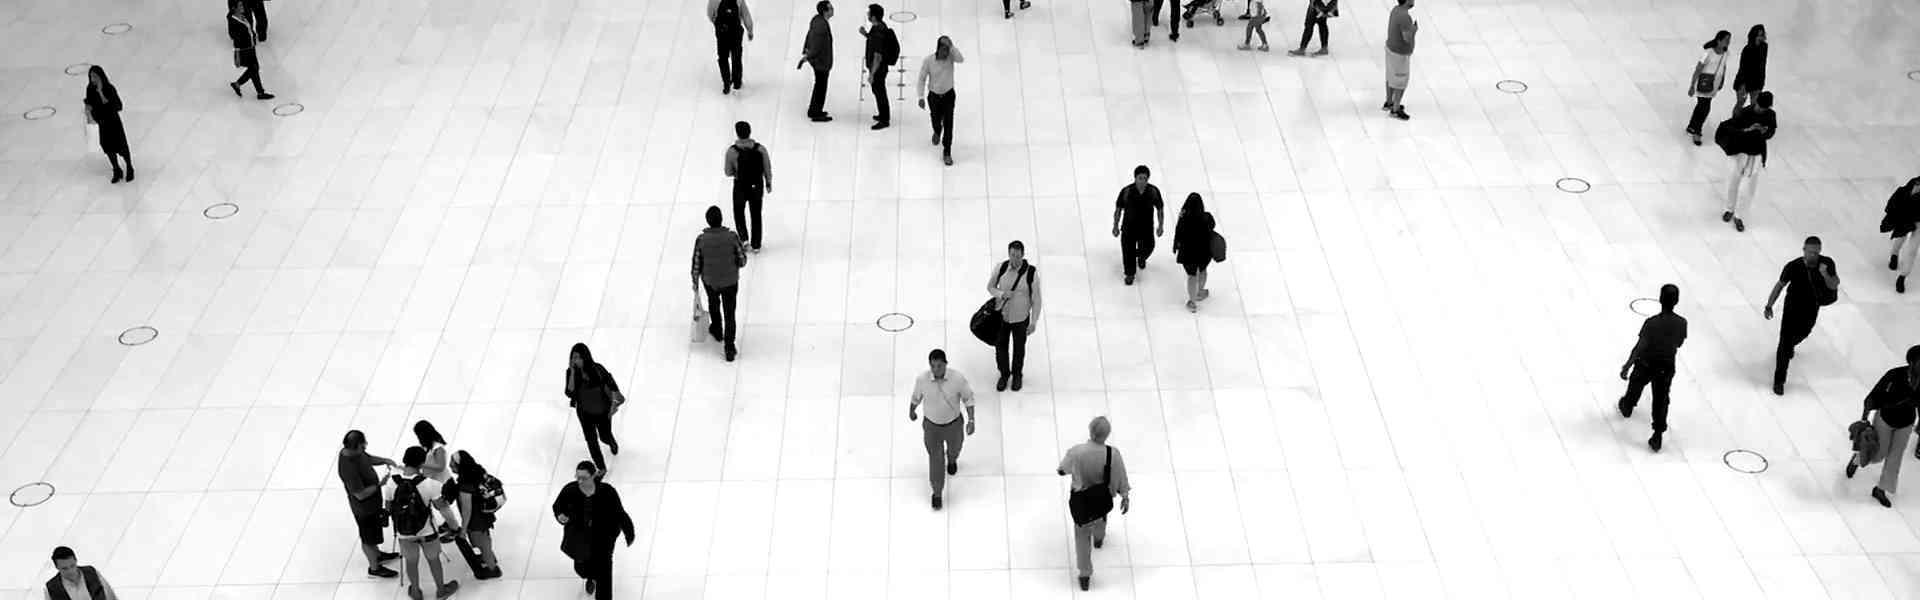 Effetto spettatore o bystander effect